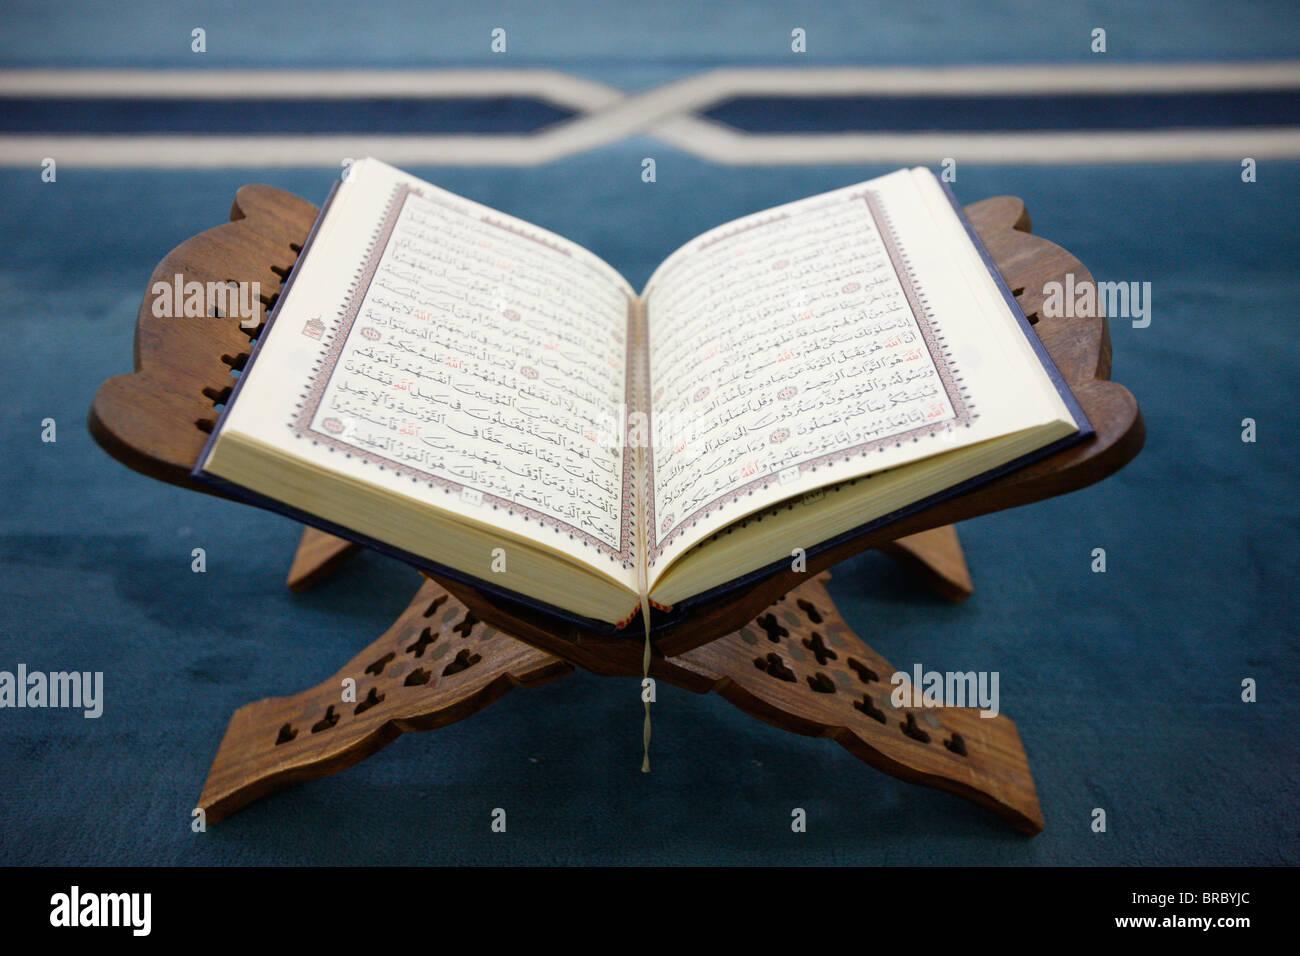 Koran on stand, Dubai, UAE - Stock Image